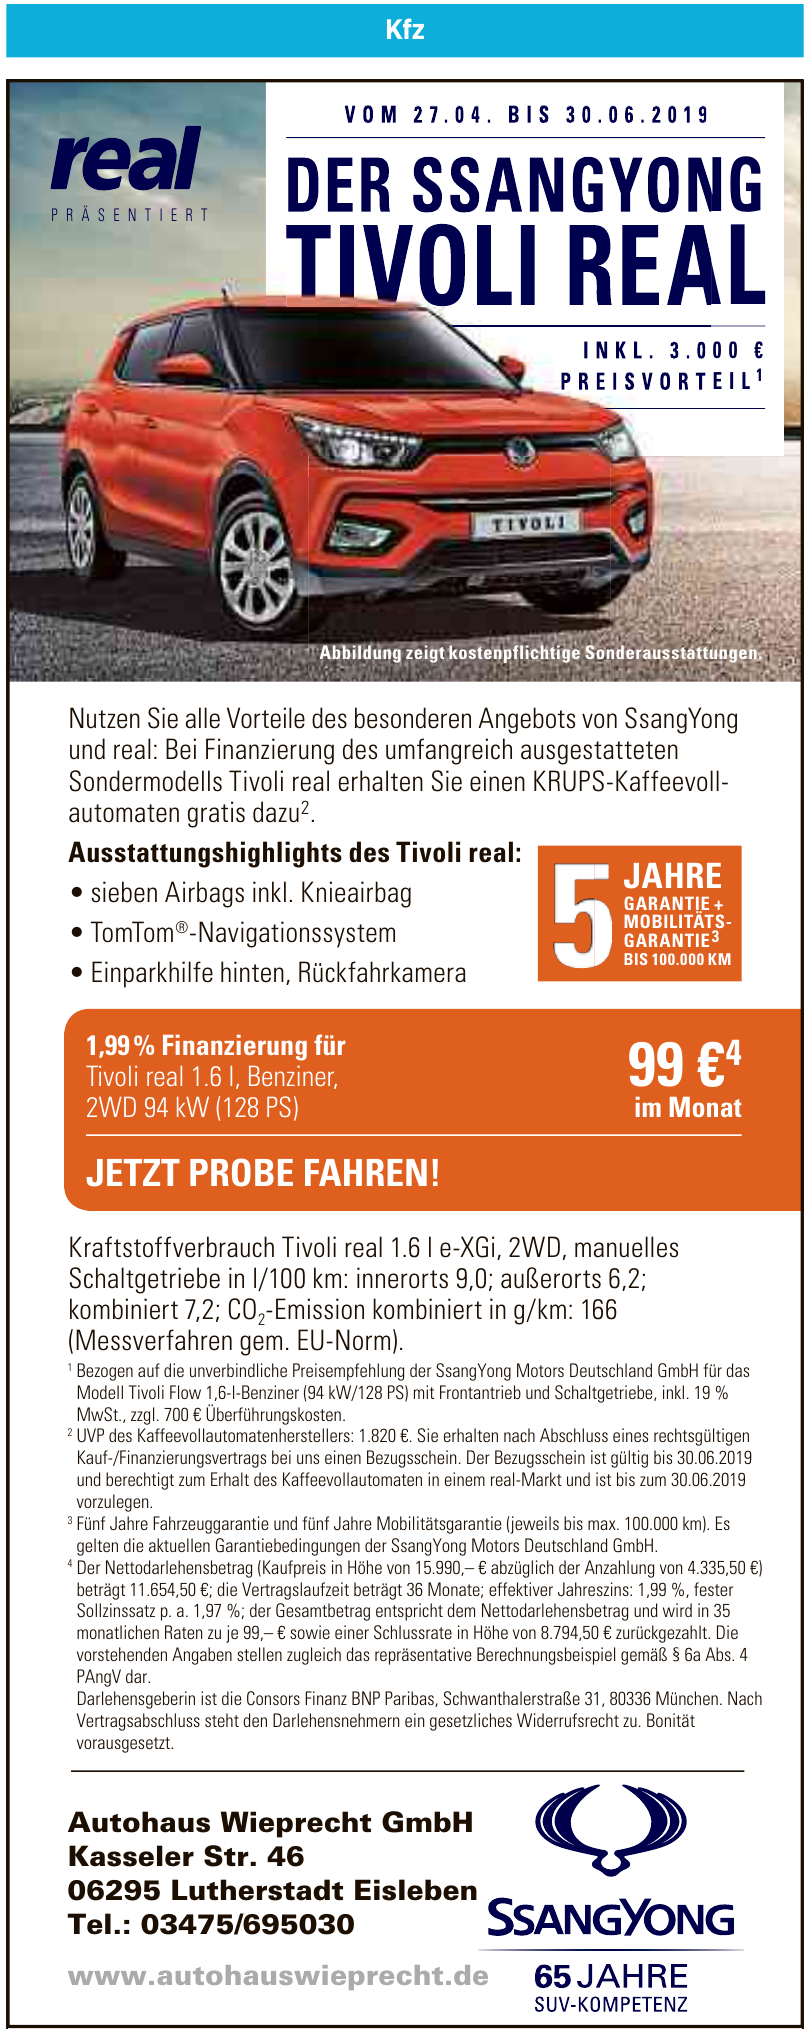 Autohaus Wieprecht GmbH